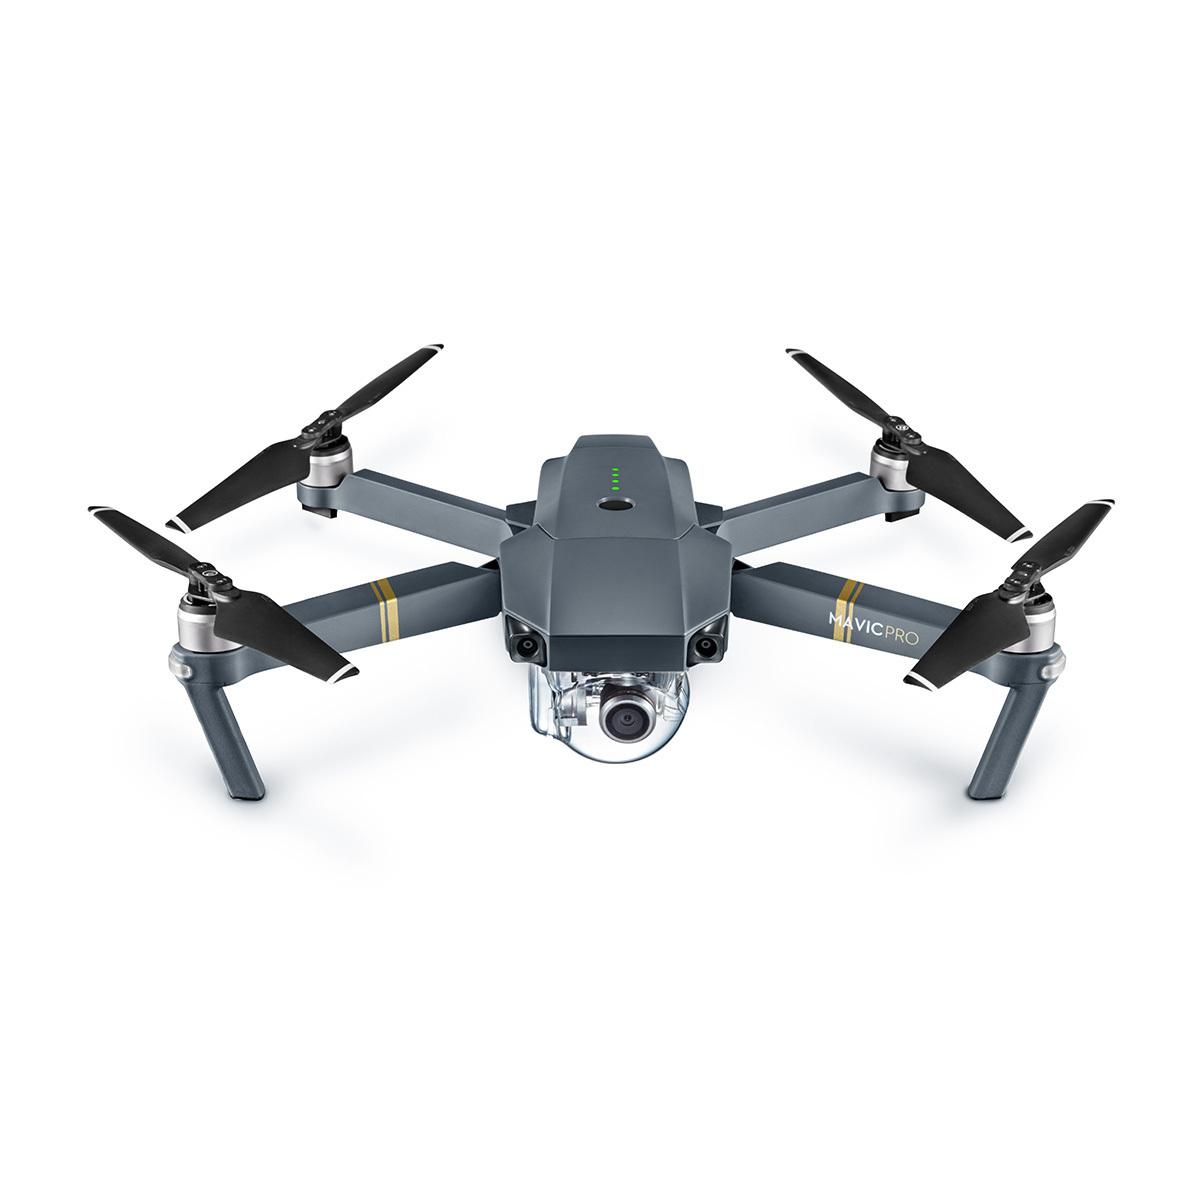 DJI MAVIC PRO 空拍機 單機組合包 (贈: 螺旋槳保護罩, 單肩包)